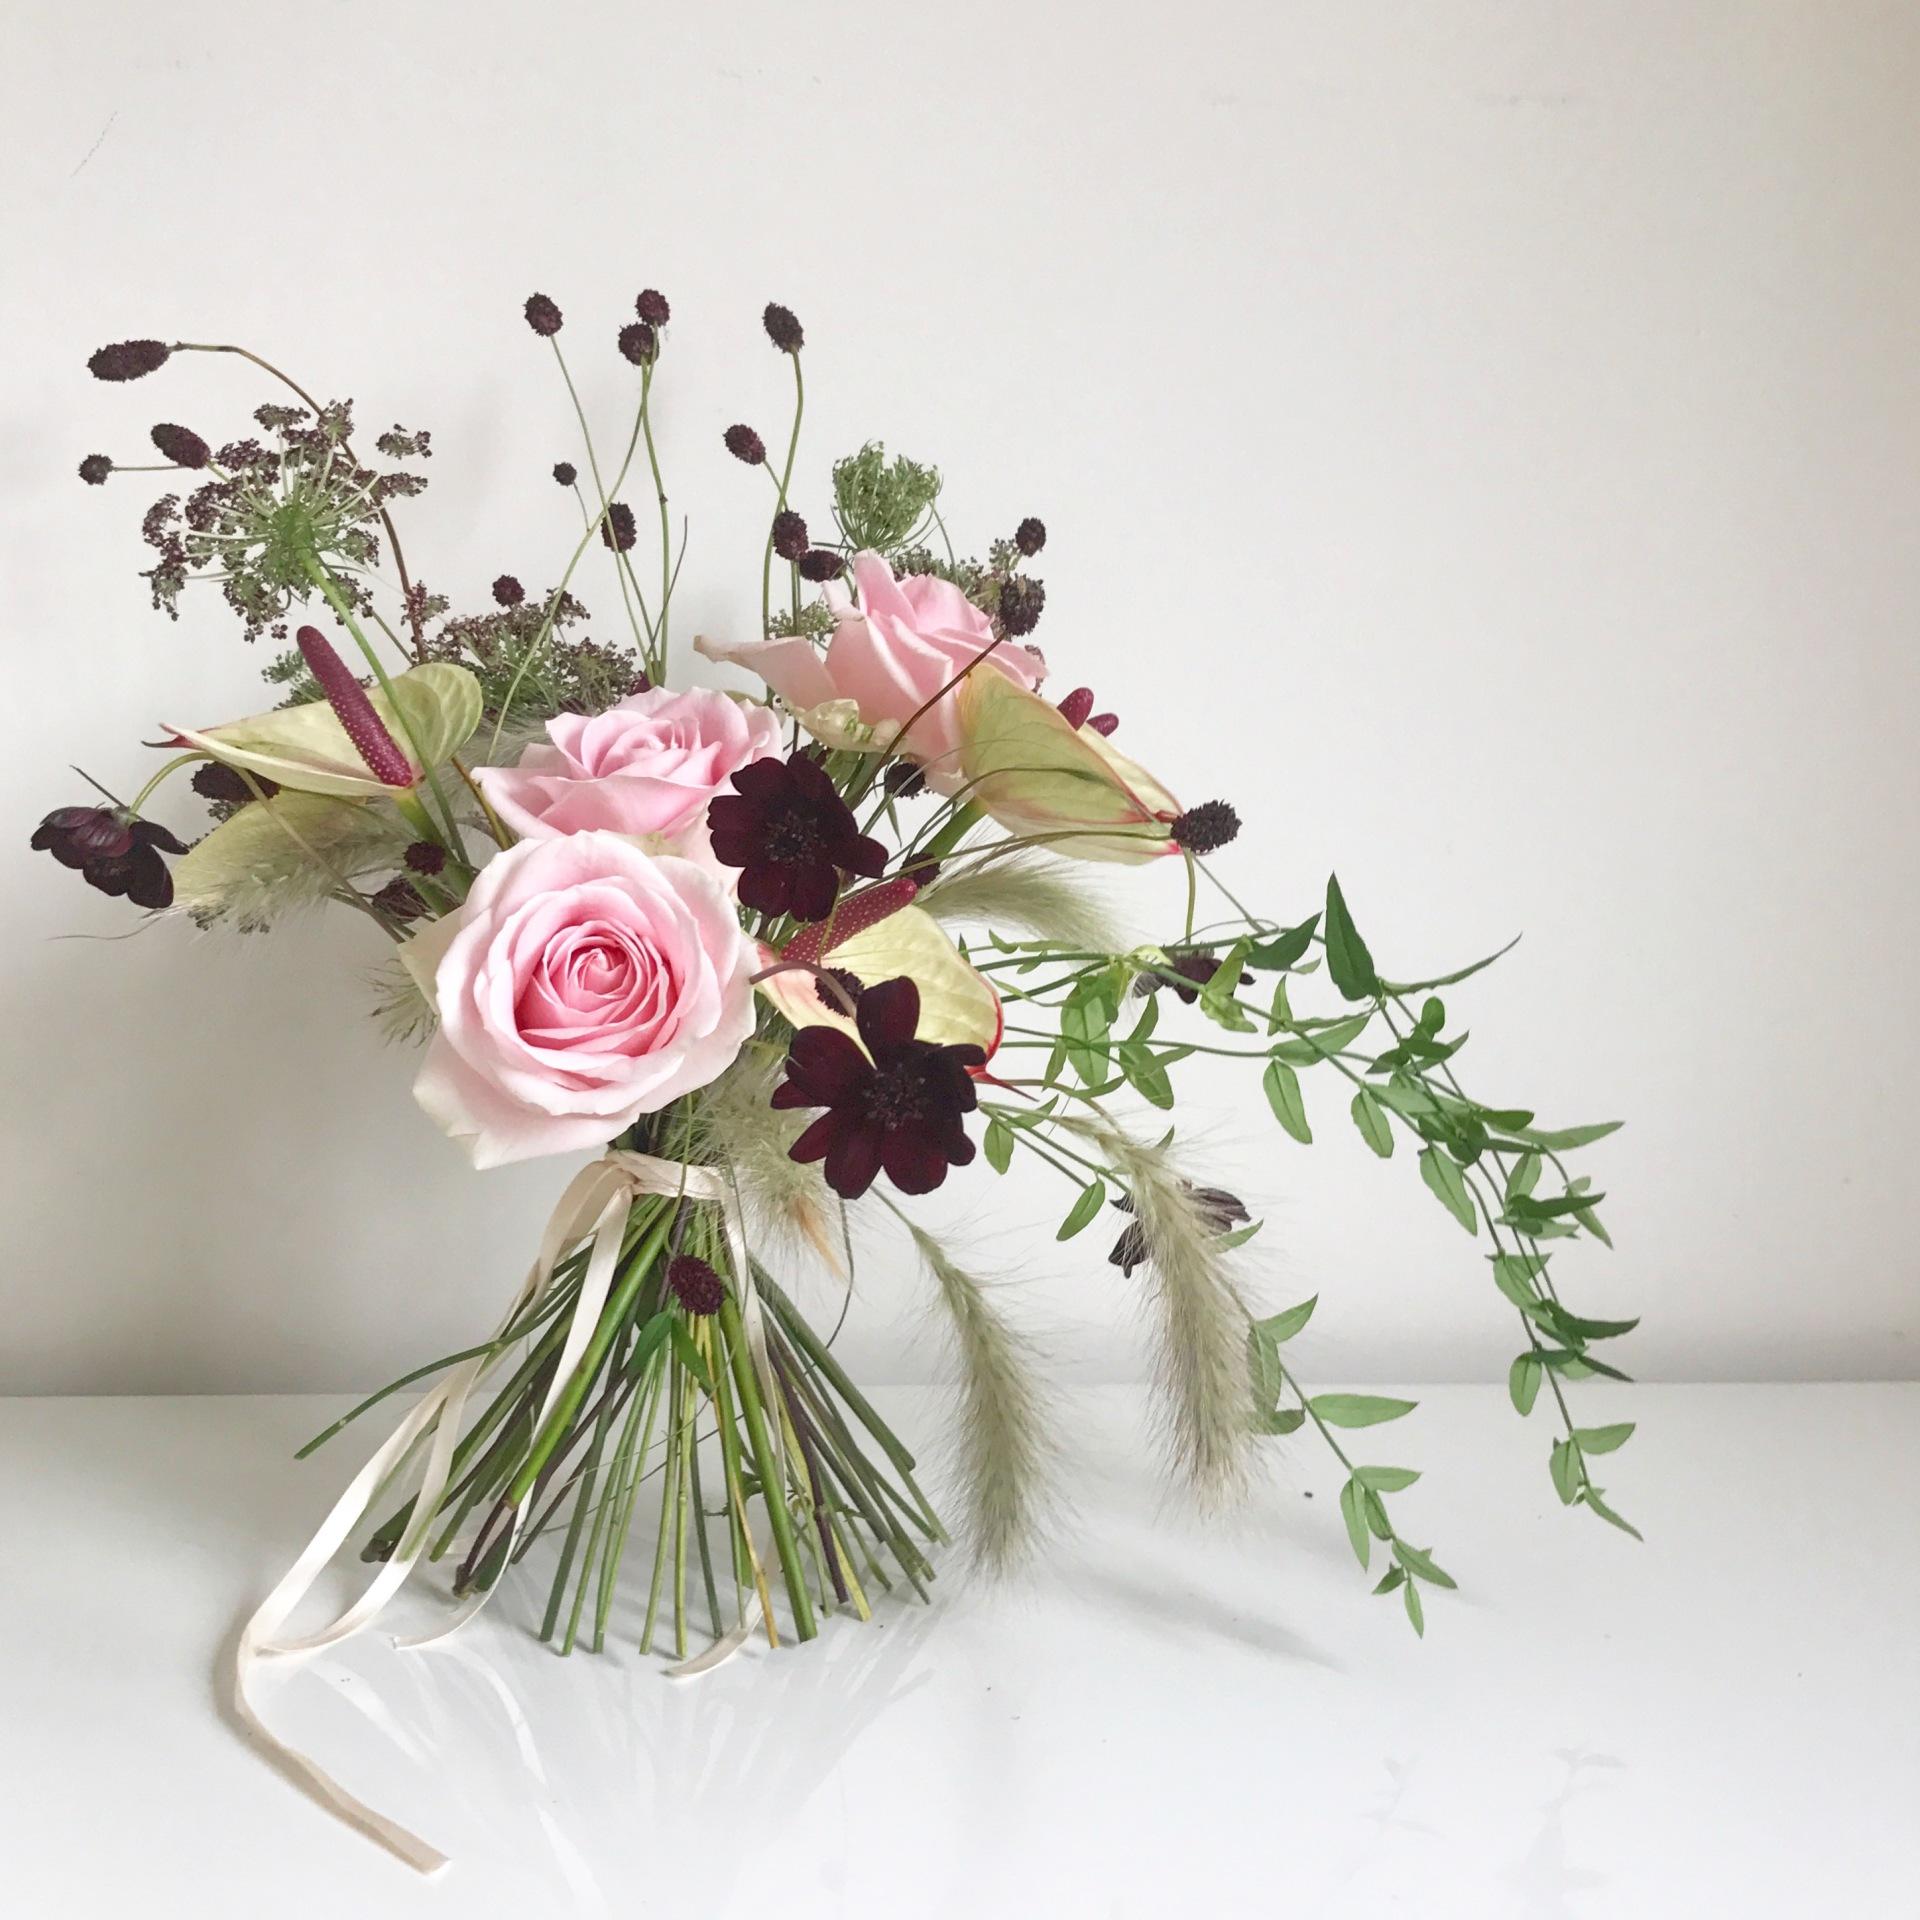 London florist | wedding bouquet | london wedding | chocolate cosmos bouquet | wedding florist london | natural florist | green florist | fun florist | beautiful flowers | posy | east London wedding | fusion wedding | urban wedding | floral artist